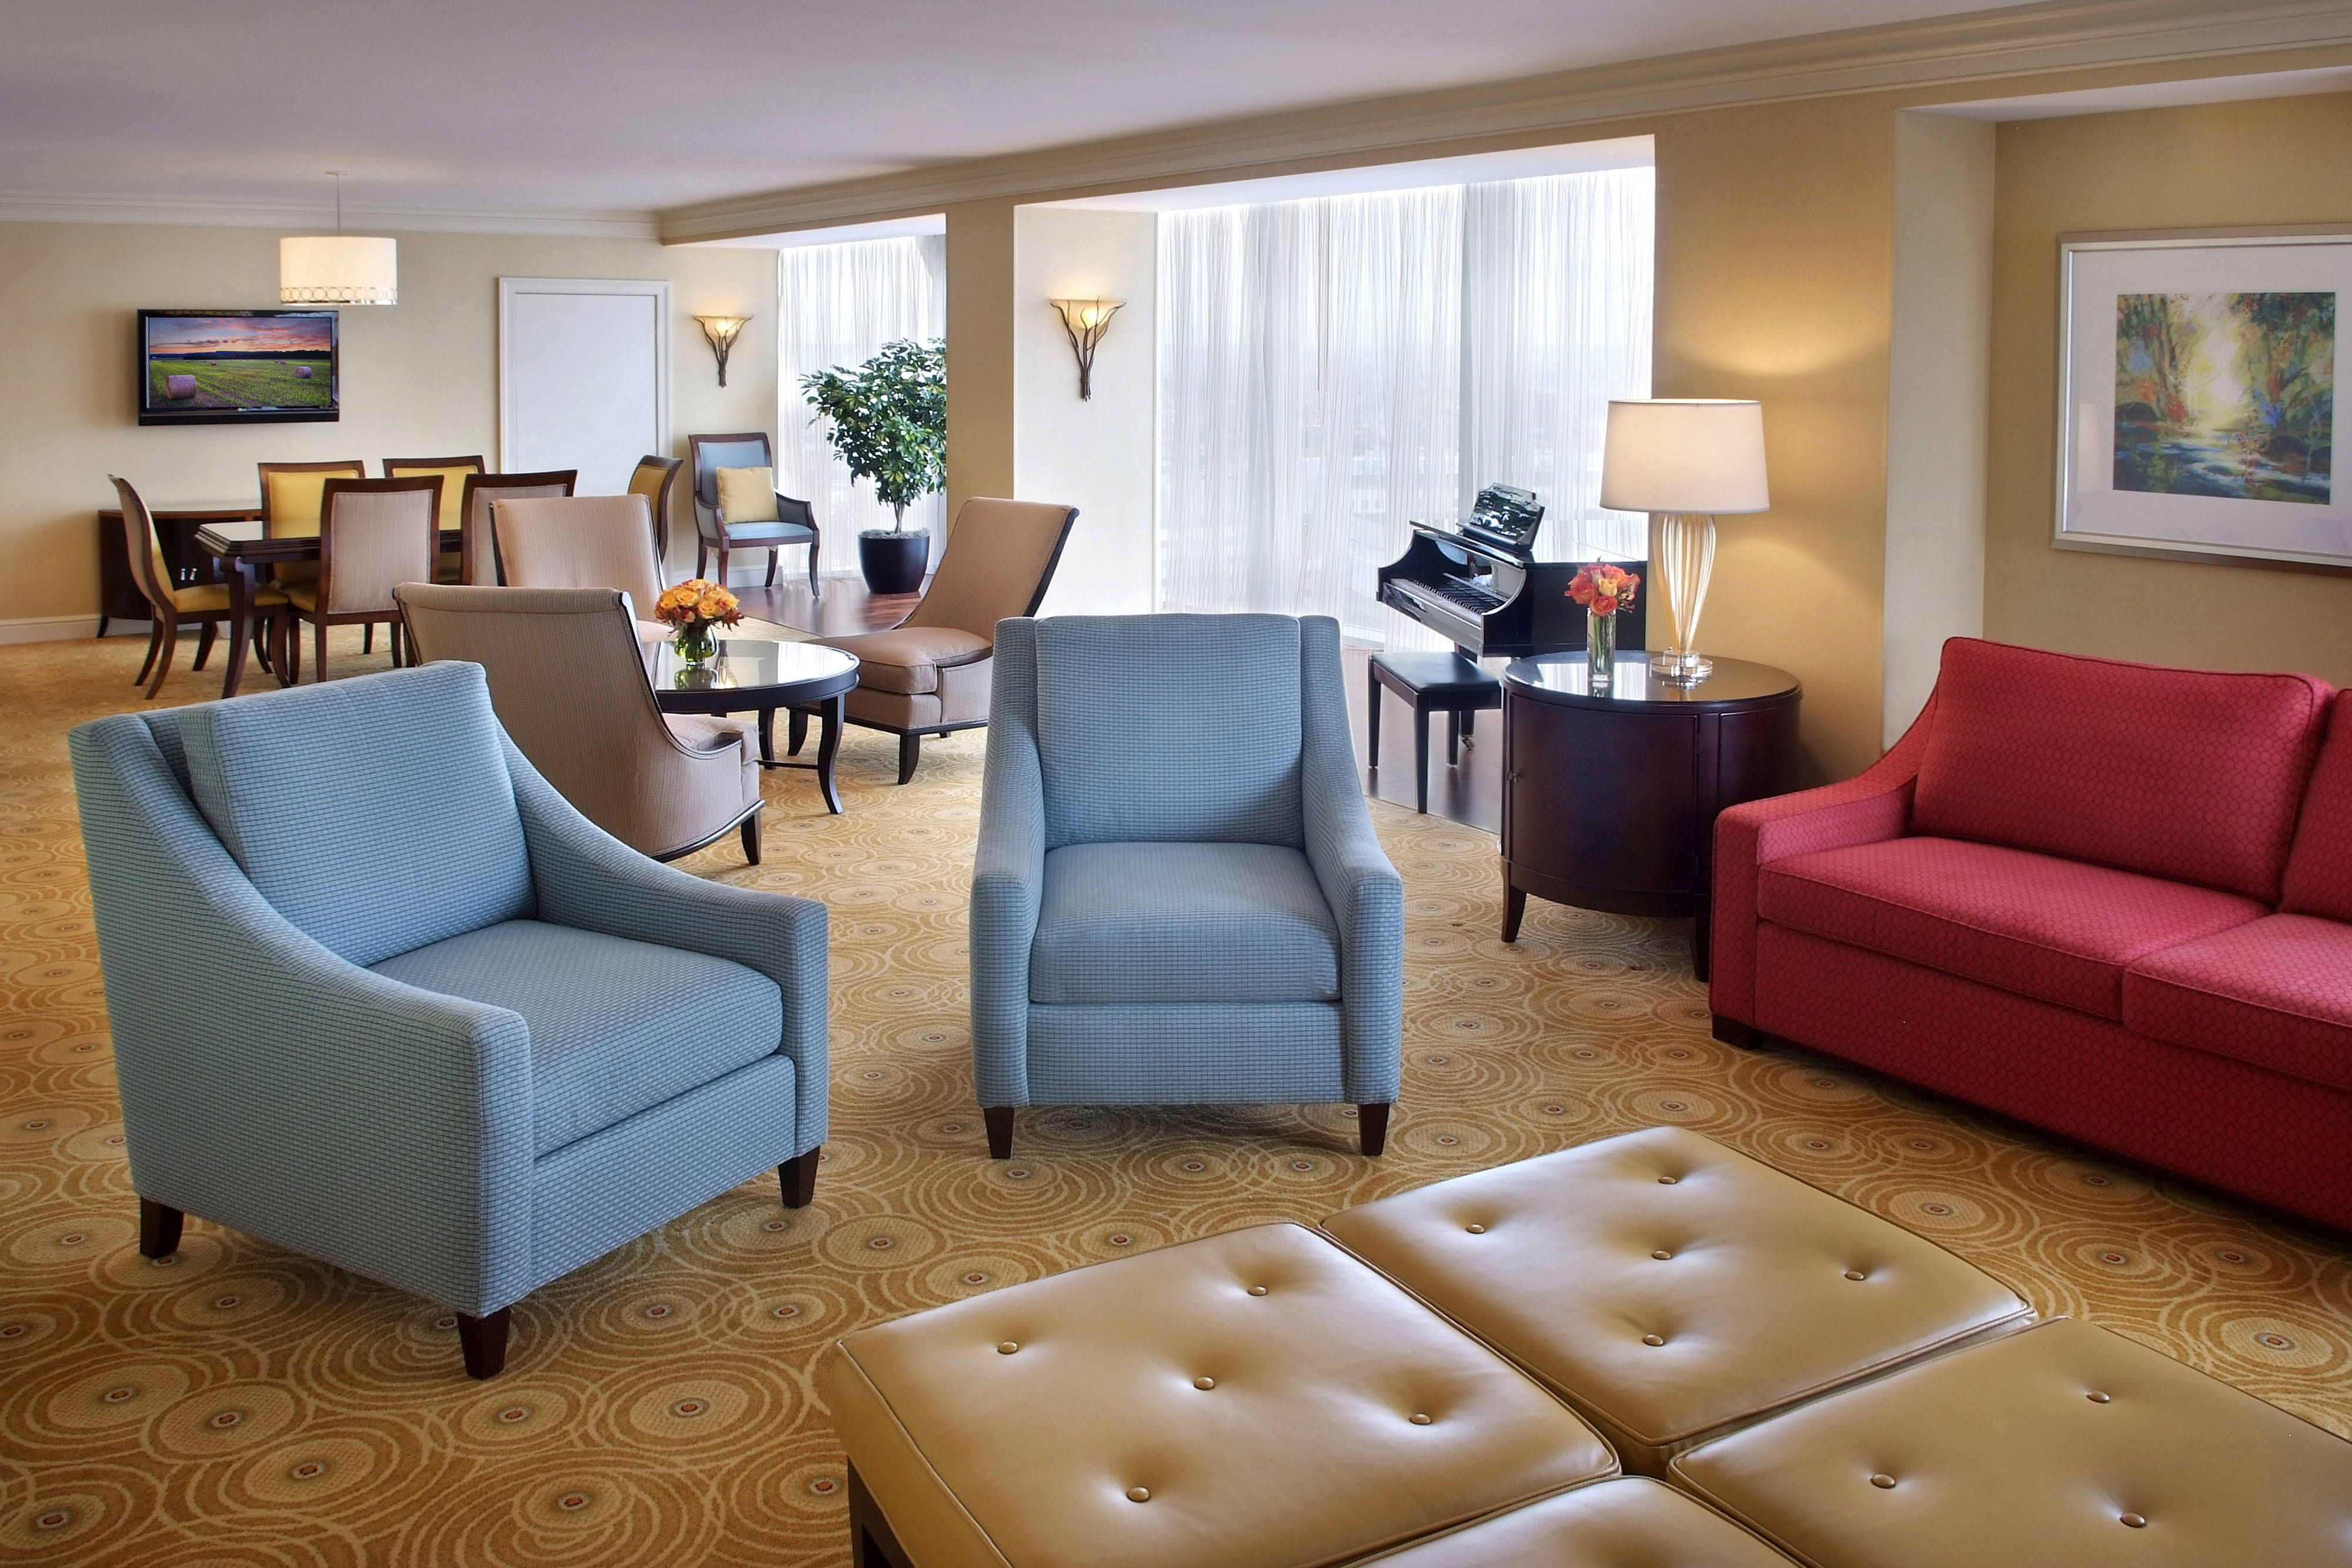 living room boston log home furniture marriott cambridge presidential suite relax guestroom travel